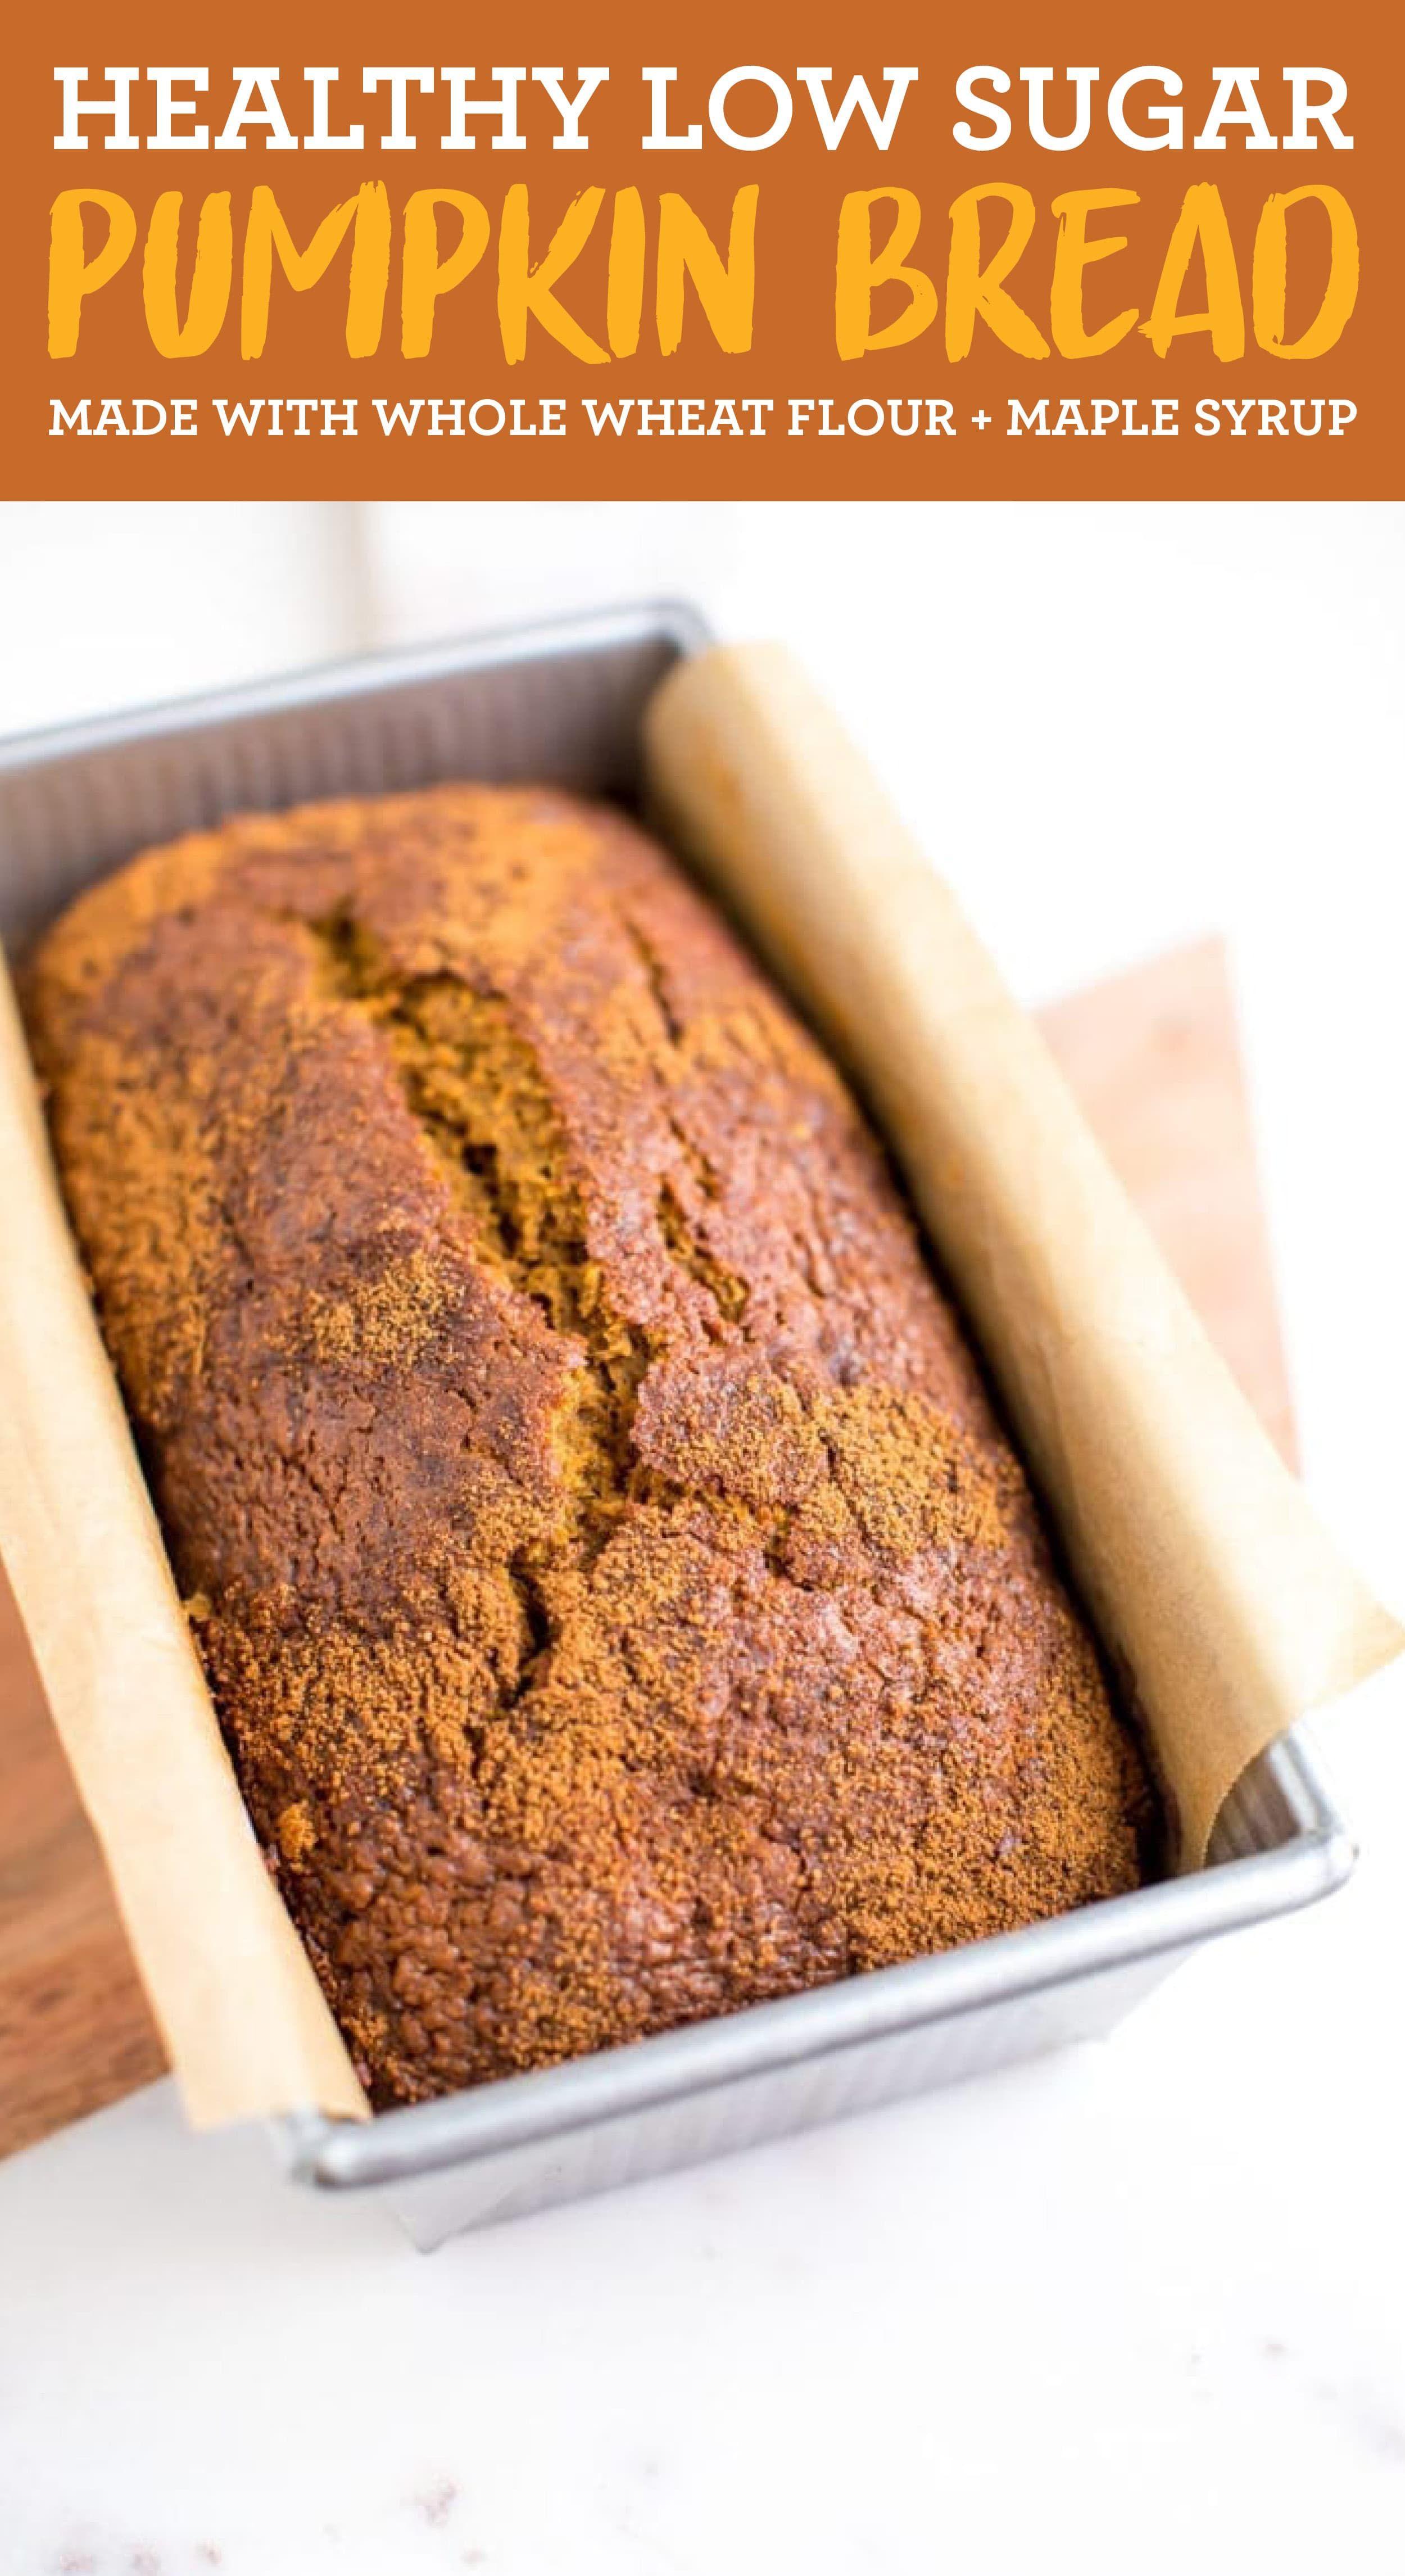 Healthy Low Sugar Pumpkin Bread Eating Bird Food Recipe In 2020 Sugar Pumpkin Healthy Pumpkin Bread Healthy Dessert Recipes